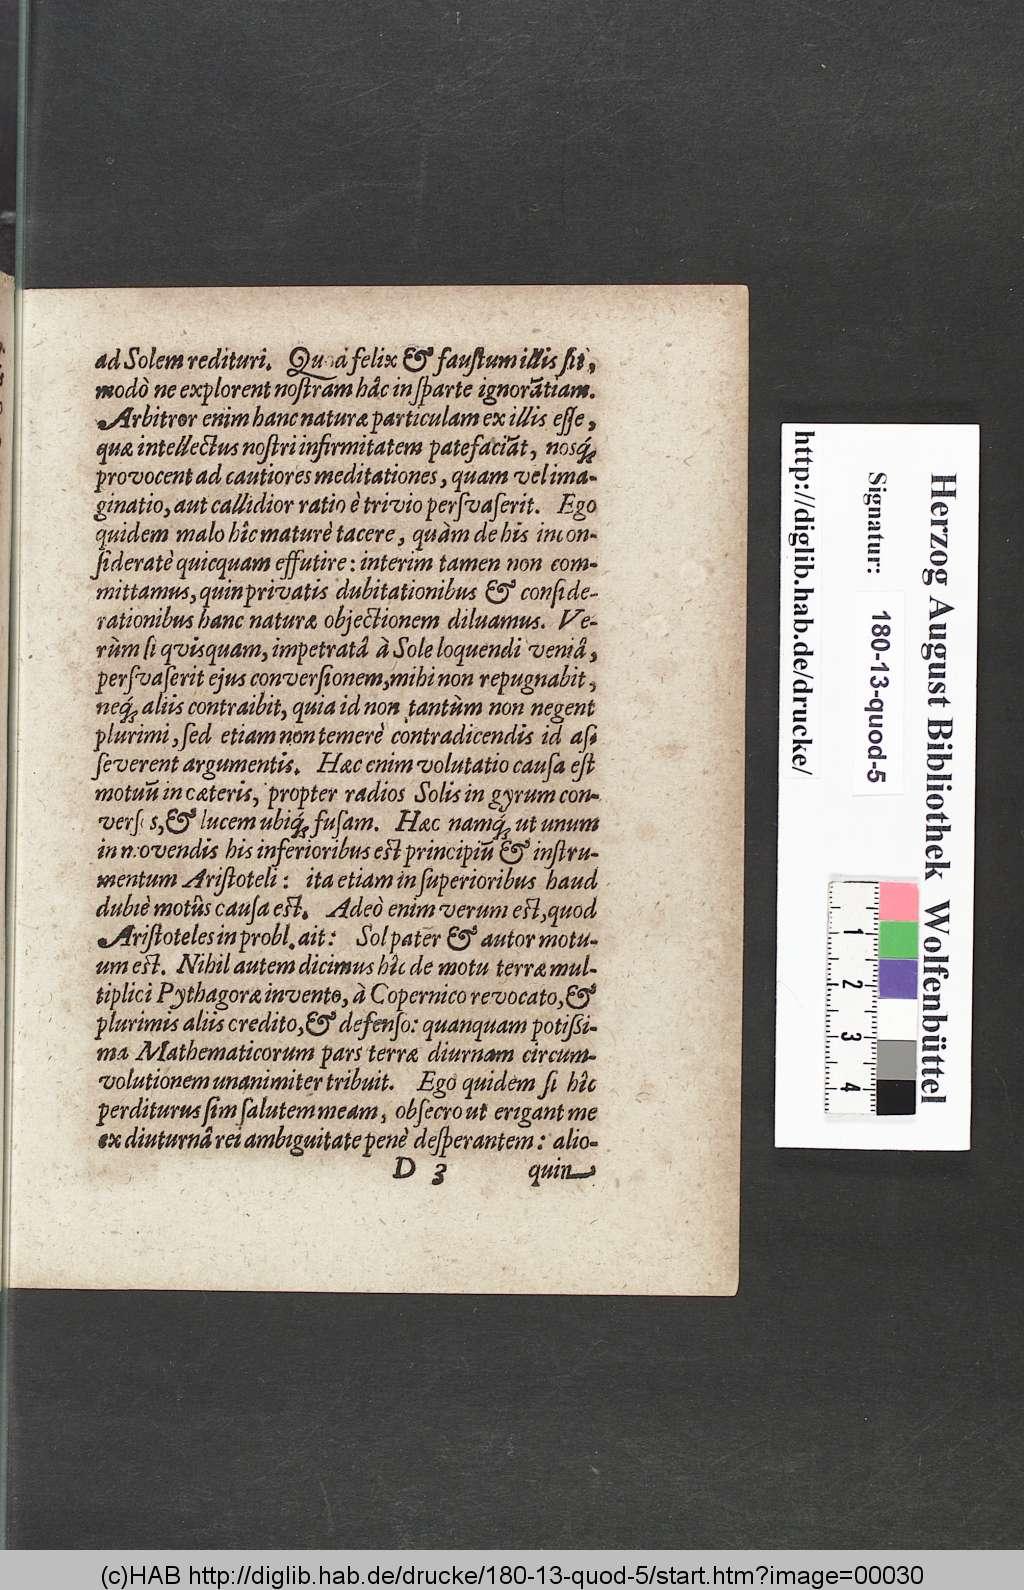 http://diglib.hab.de/drucke/180-13-quod-5/00030.jpg